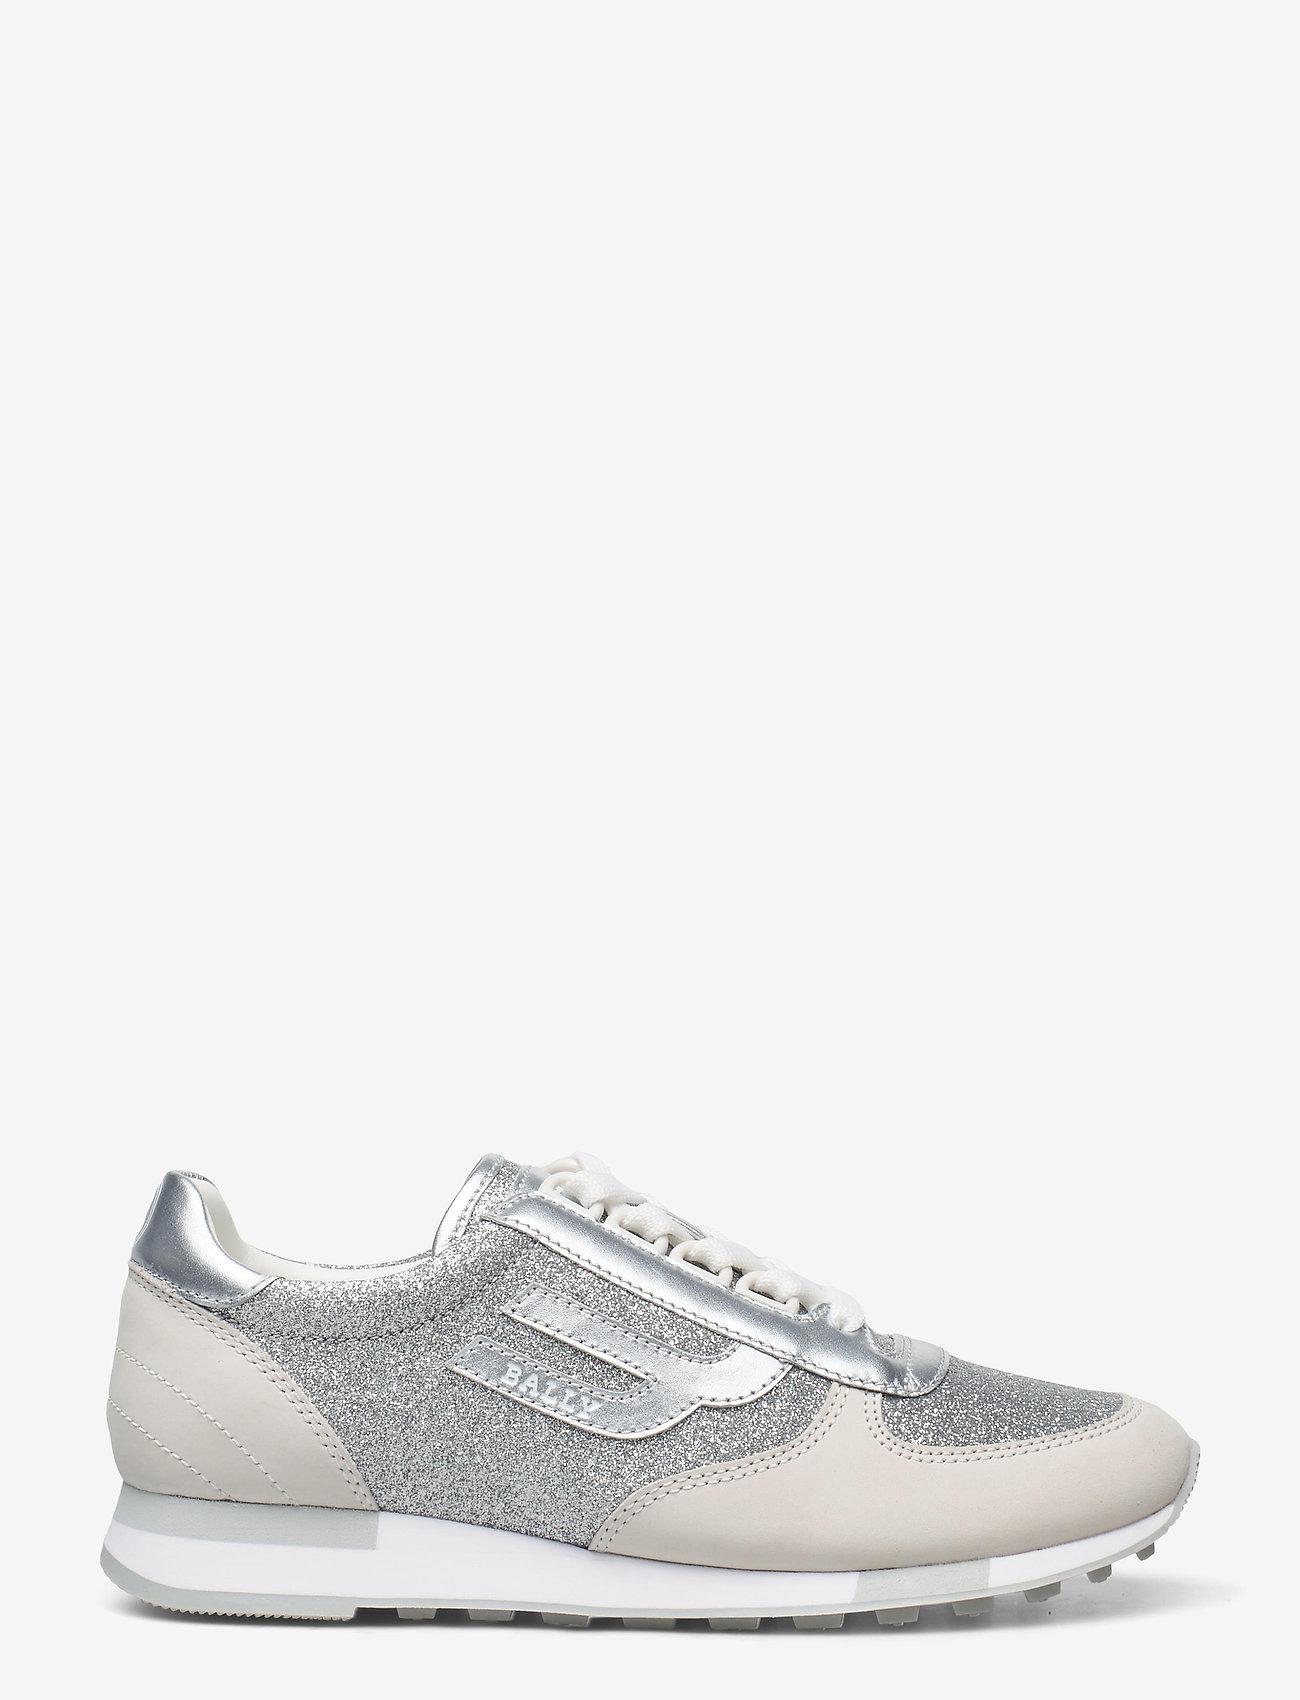 Bally - GAVINIA-T/01 - lage sneakers - 02001 silver 17 - 1